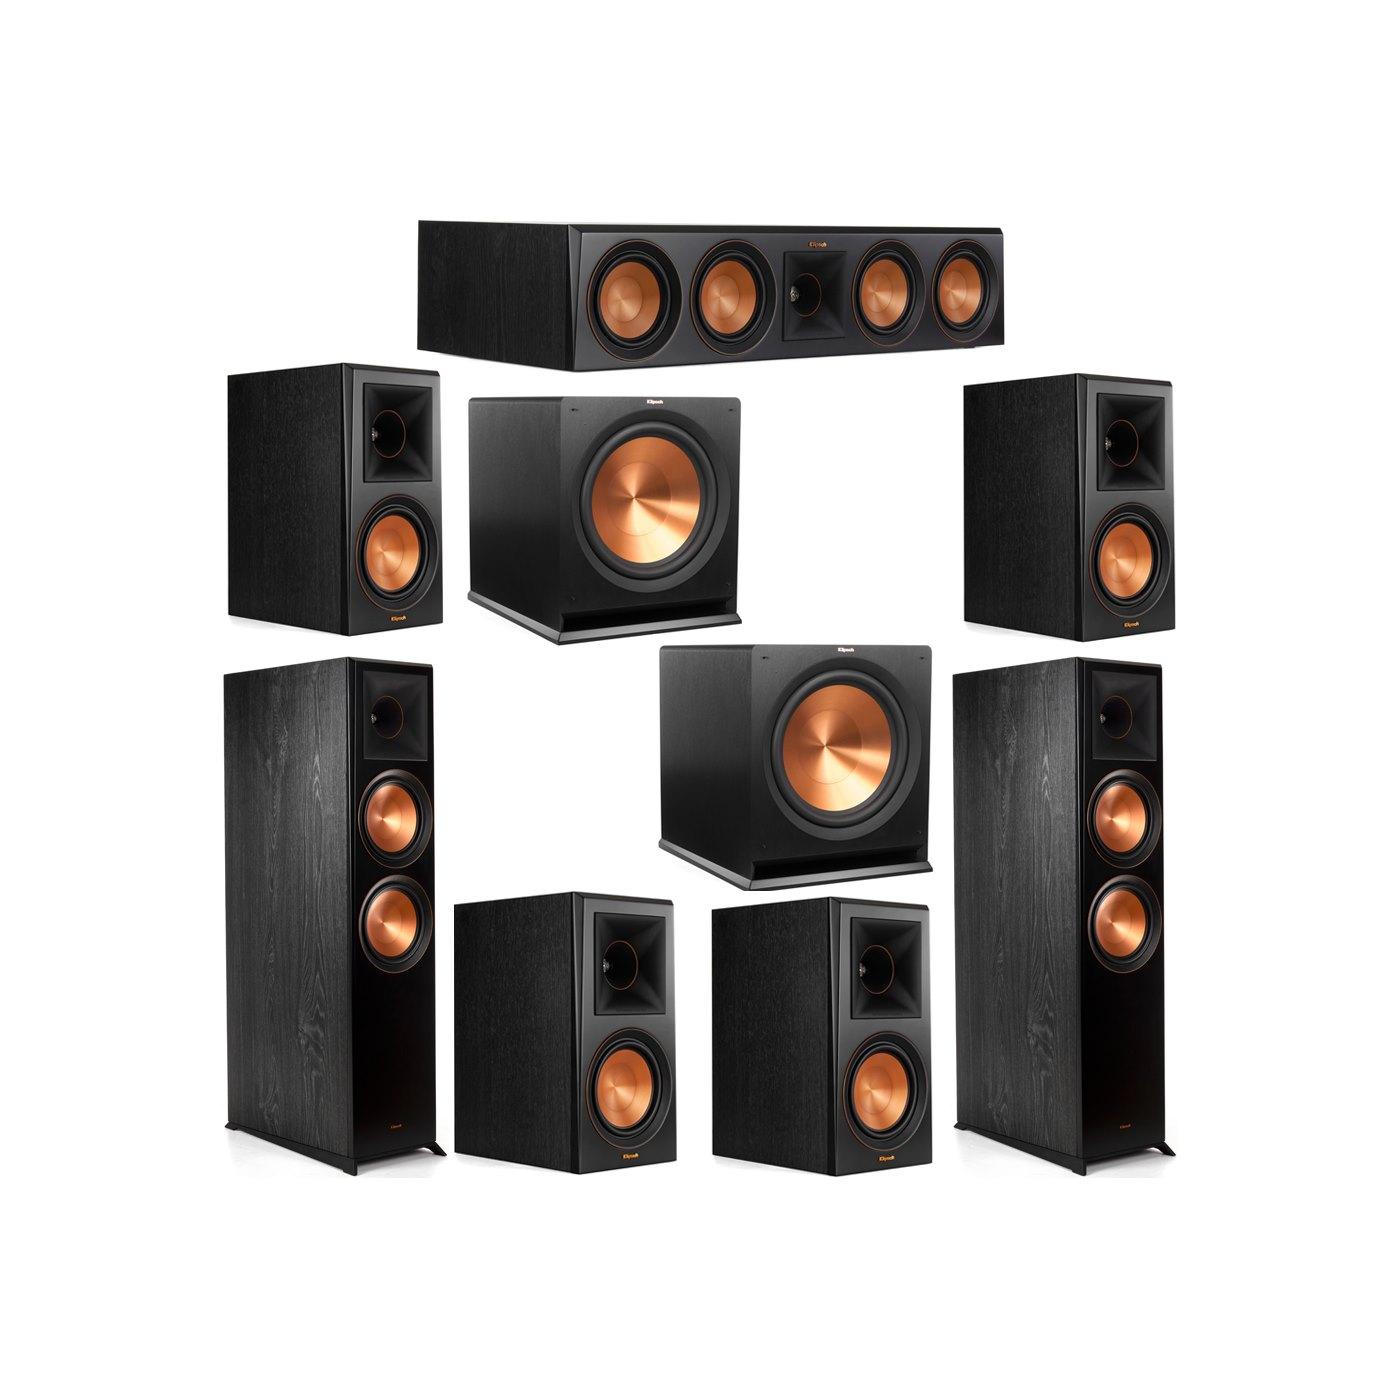 Klipsch 7.2 System with 2 RP-8000F Floorstanding Speakers, 1 Klipsch RP-504C Center Speaker, 4 Klipsch RP-600M Surround Speakers, 2 Klipsch R-115SW Subwoofers